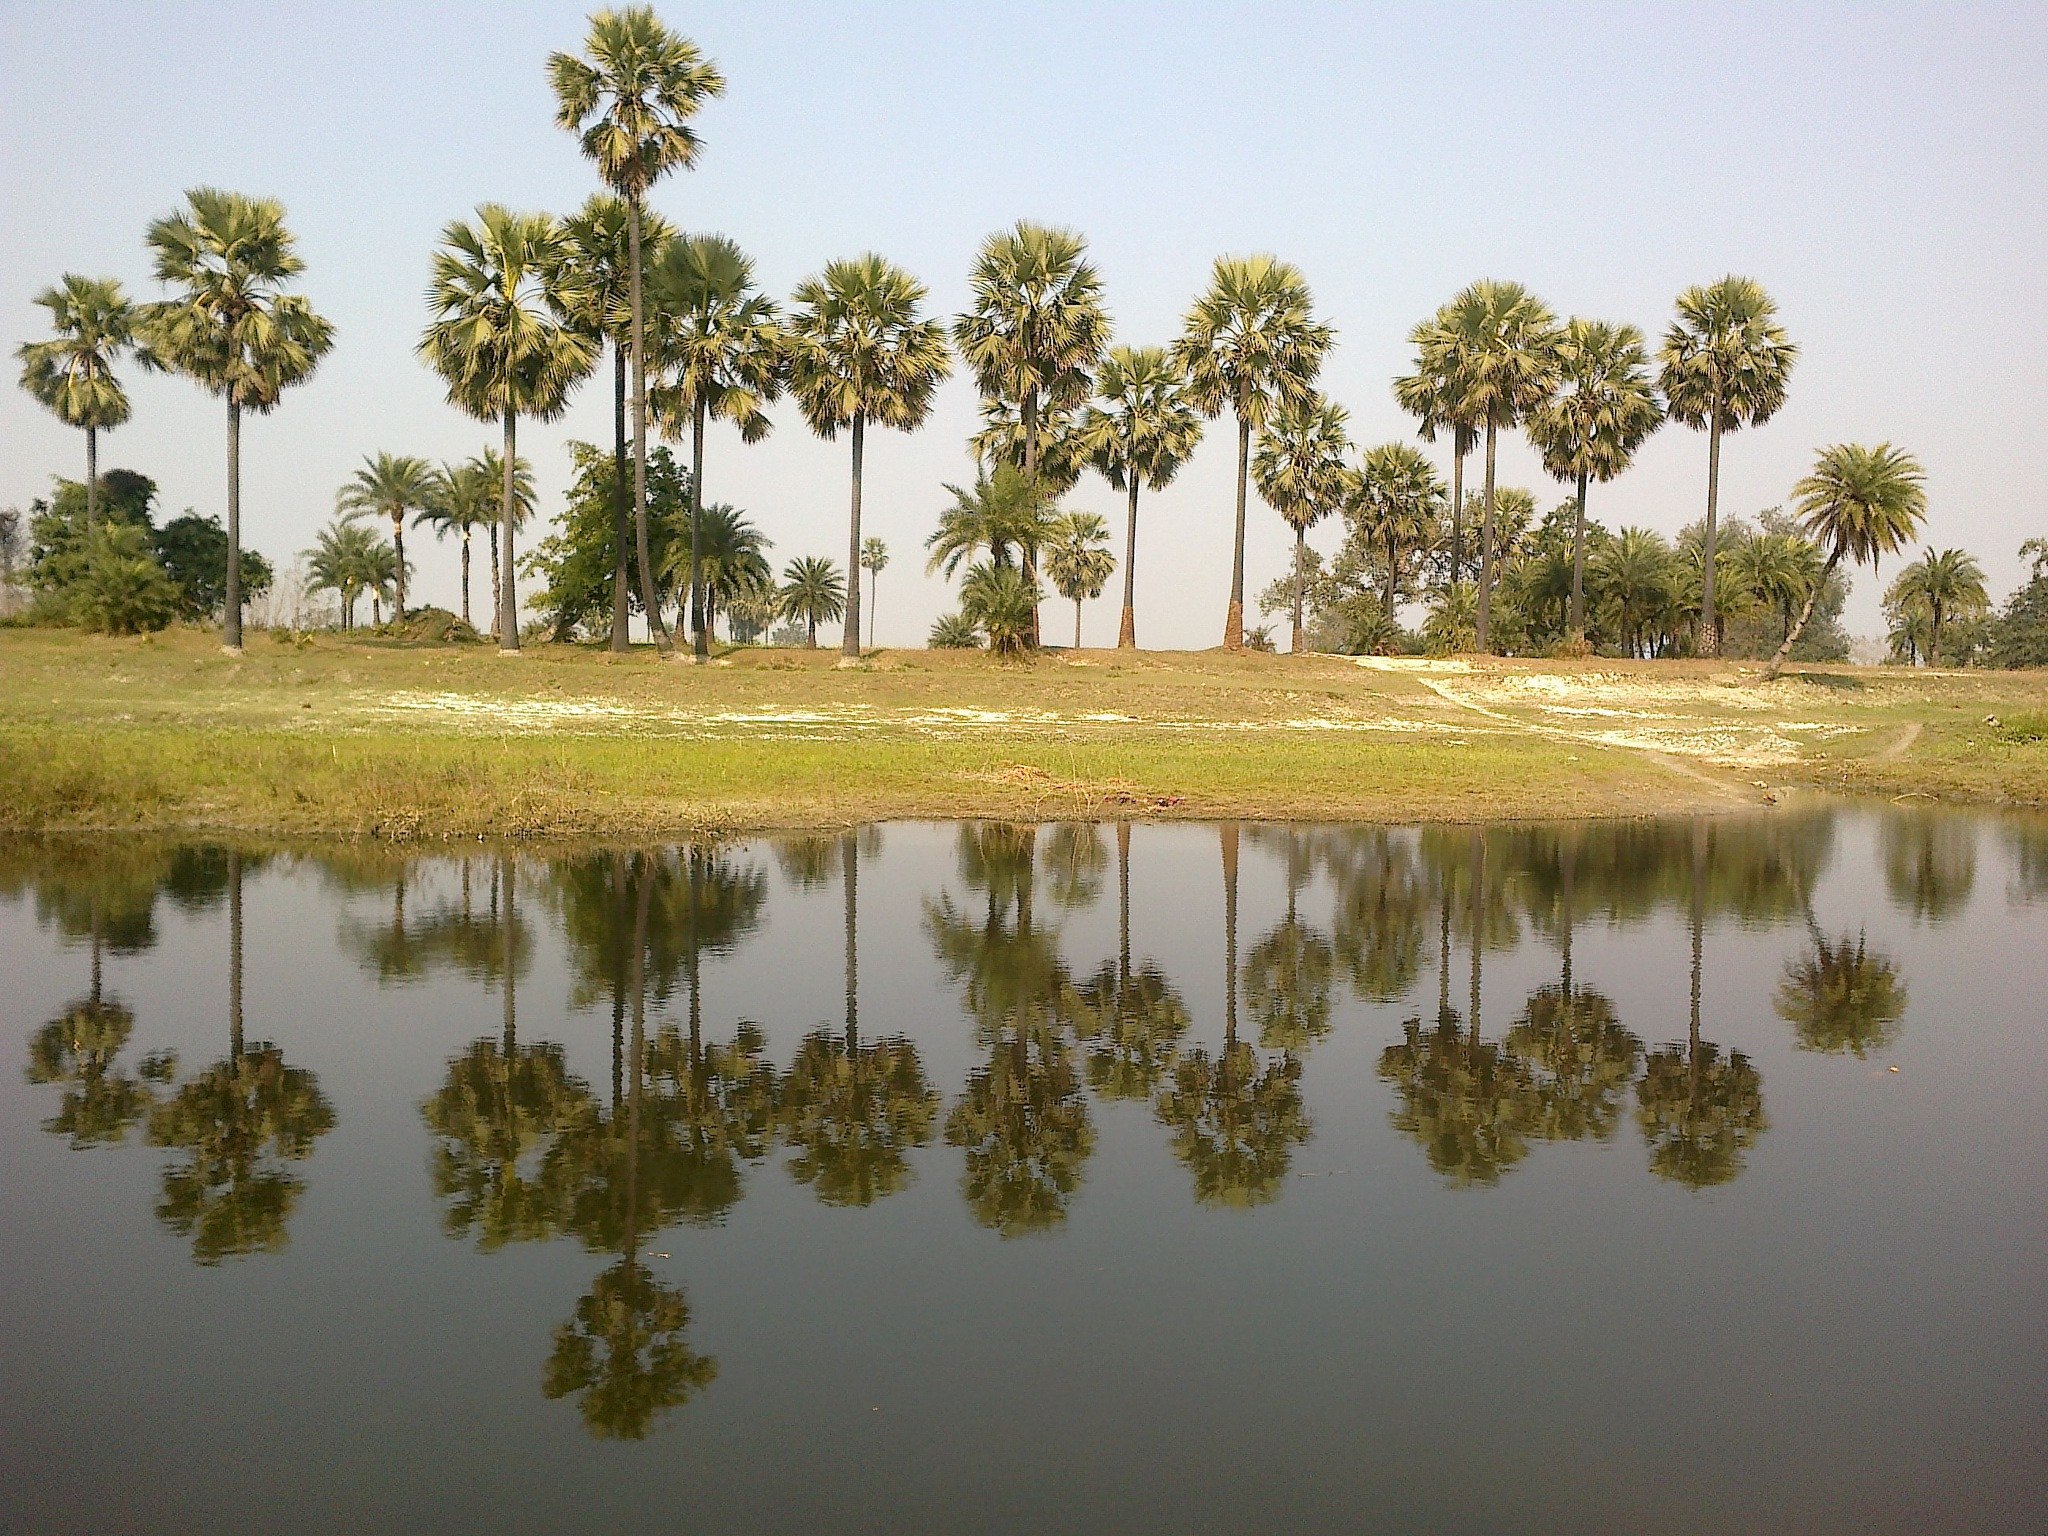 Reflection by Satya